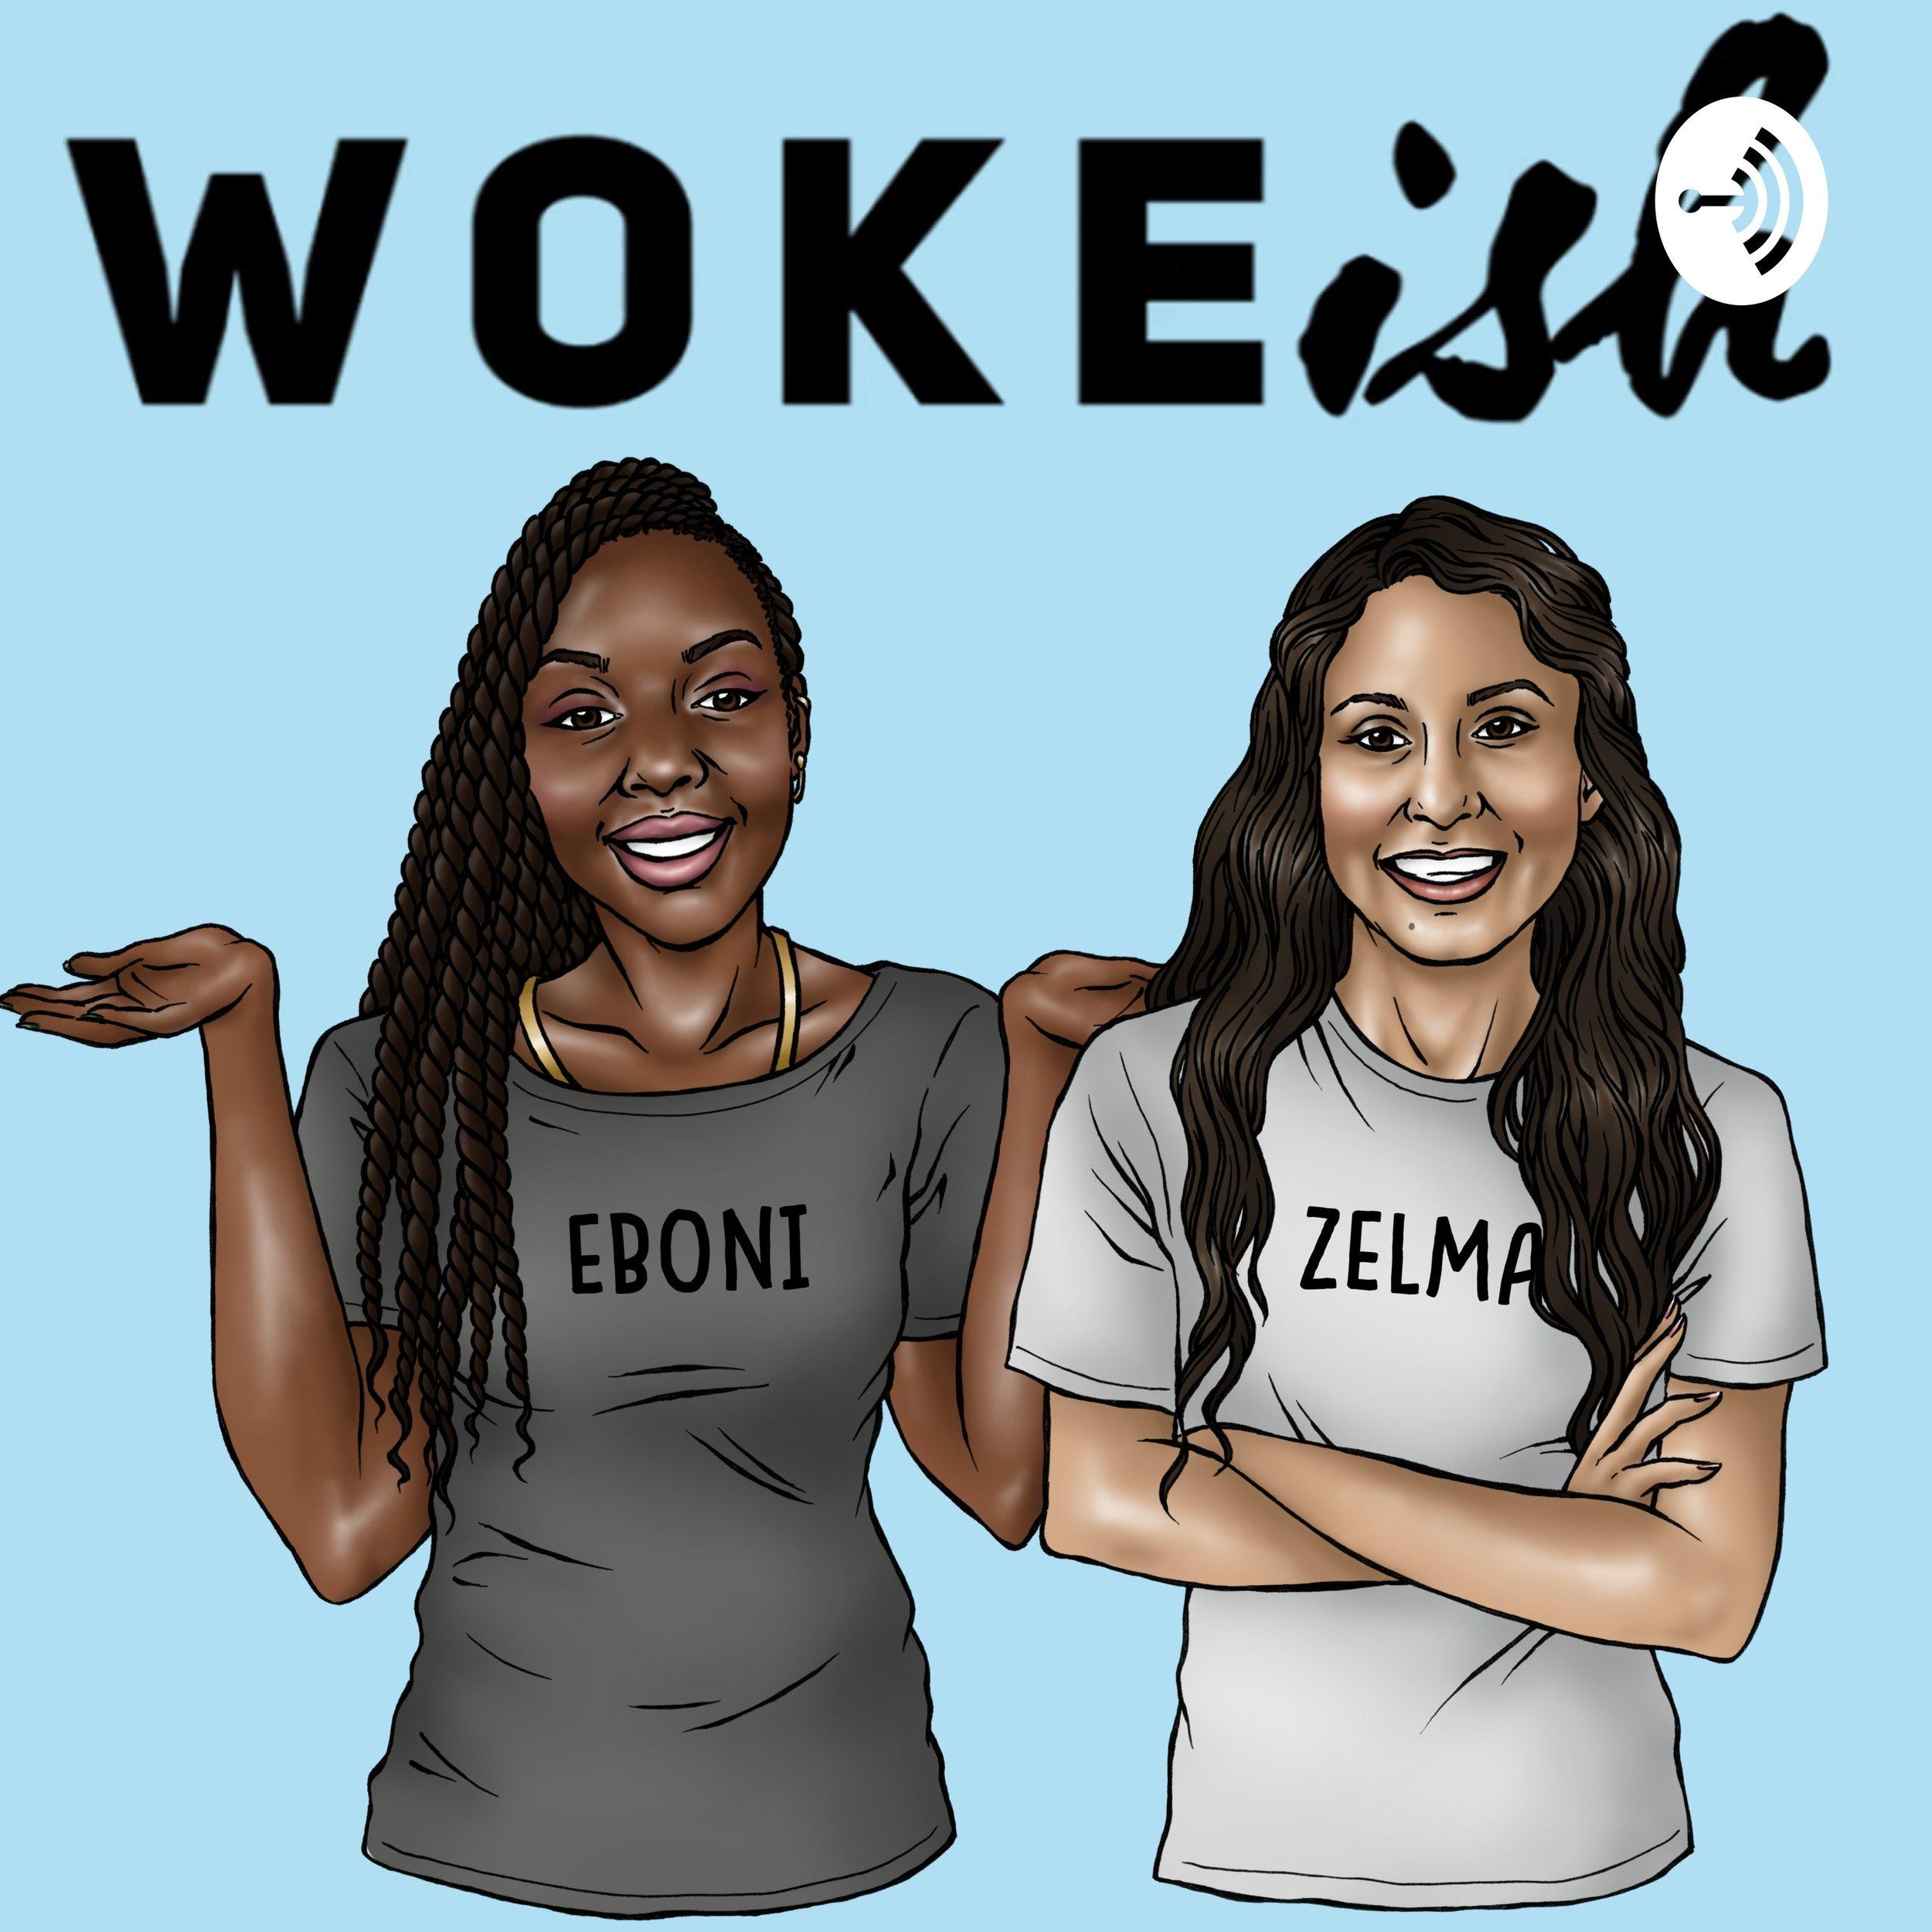 woke-ish